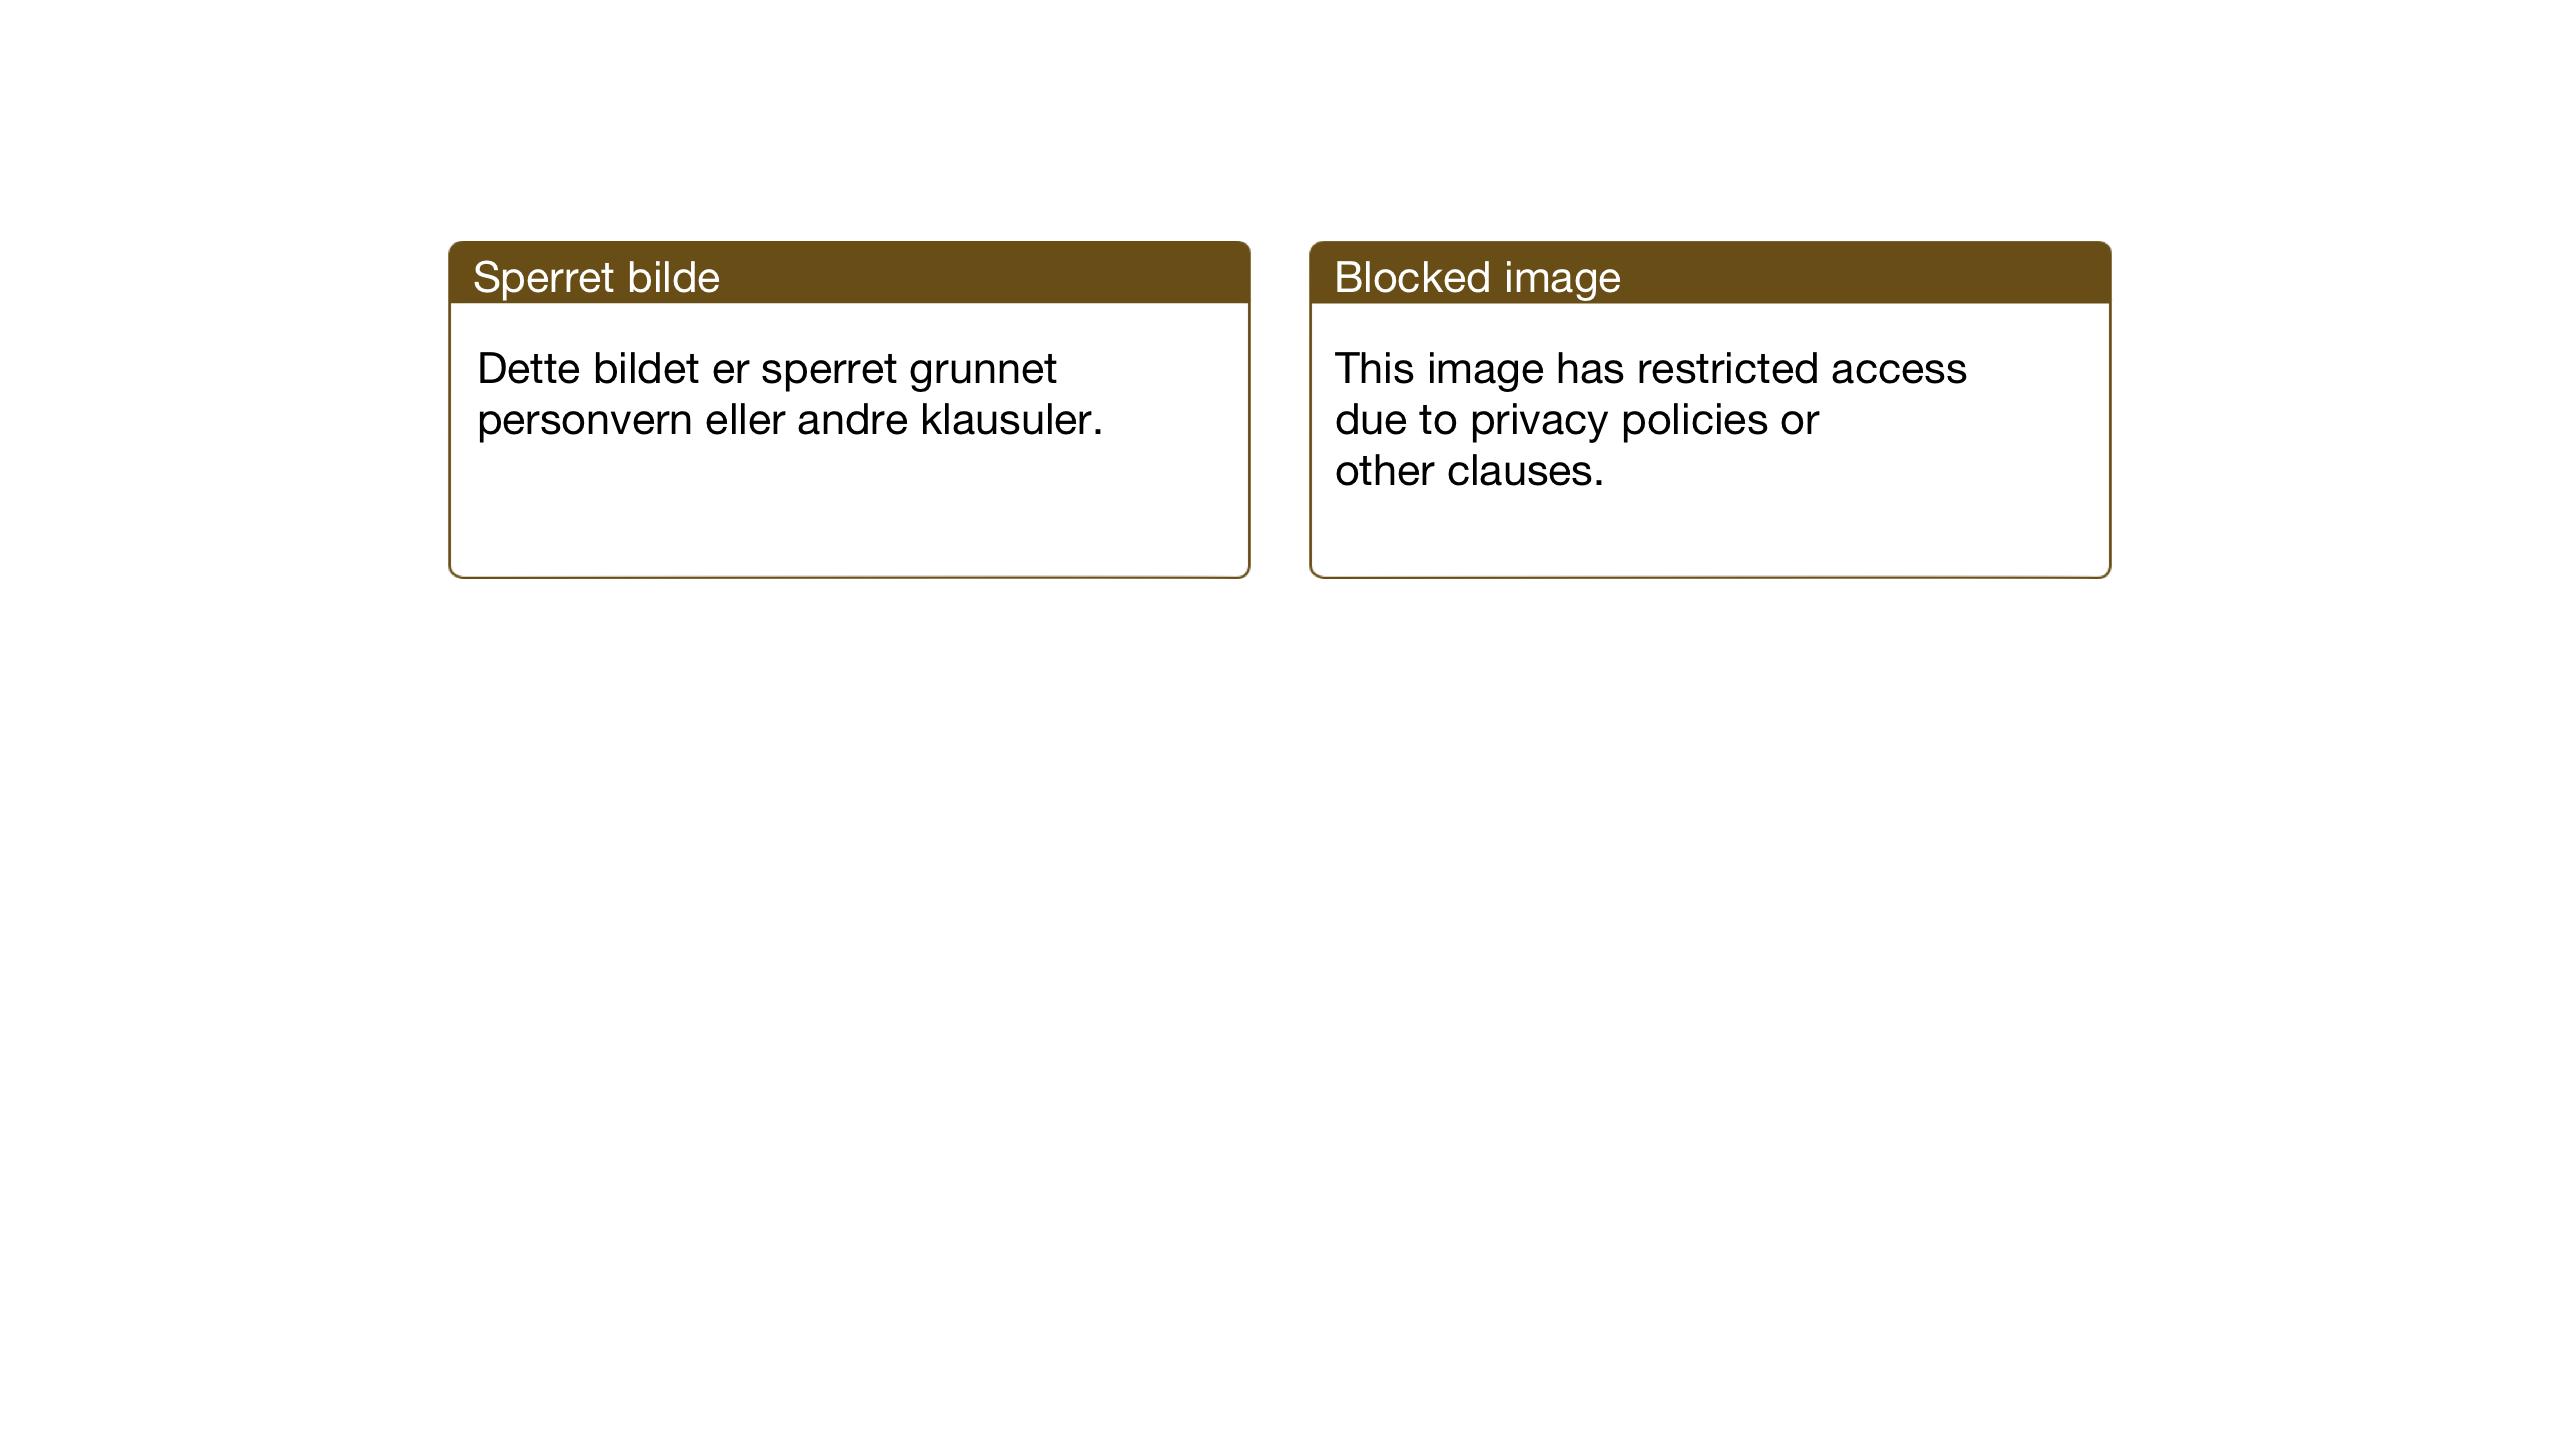 SAT, Ministerialprotokoller, klokkerbøker og fødselsregistre - Nordland, 882/L1183: Klokkerbok nr. 882C01, 1911-1938, s. 122